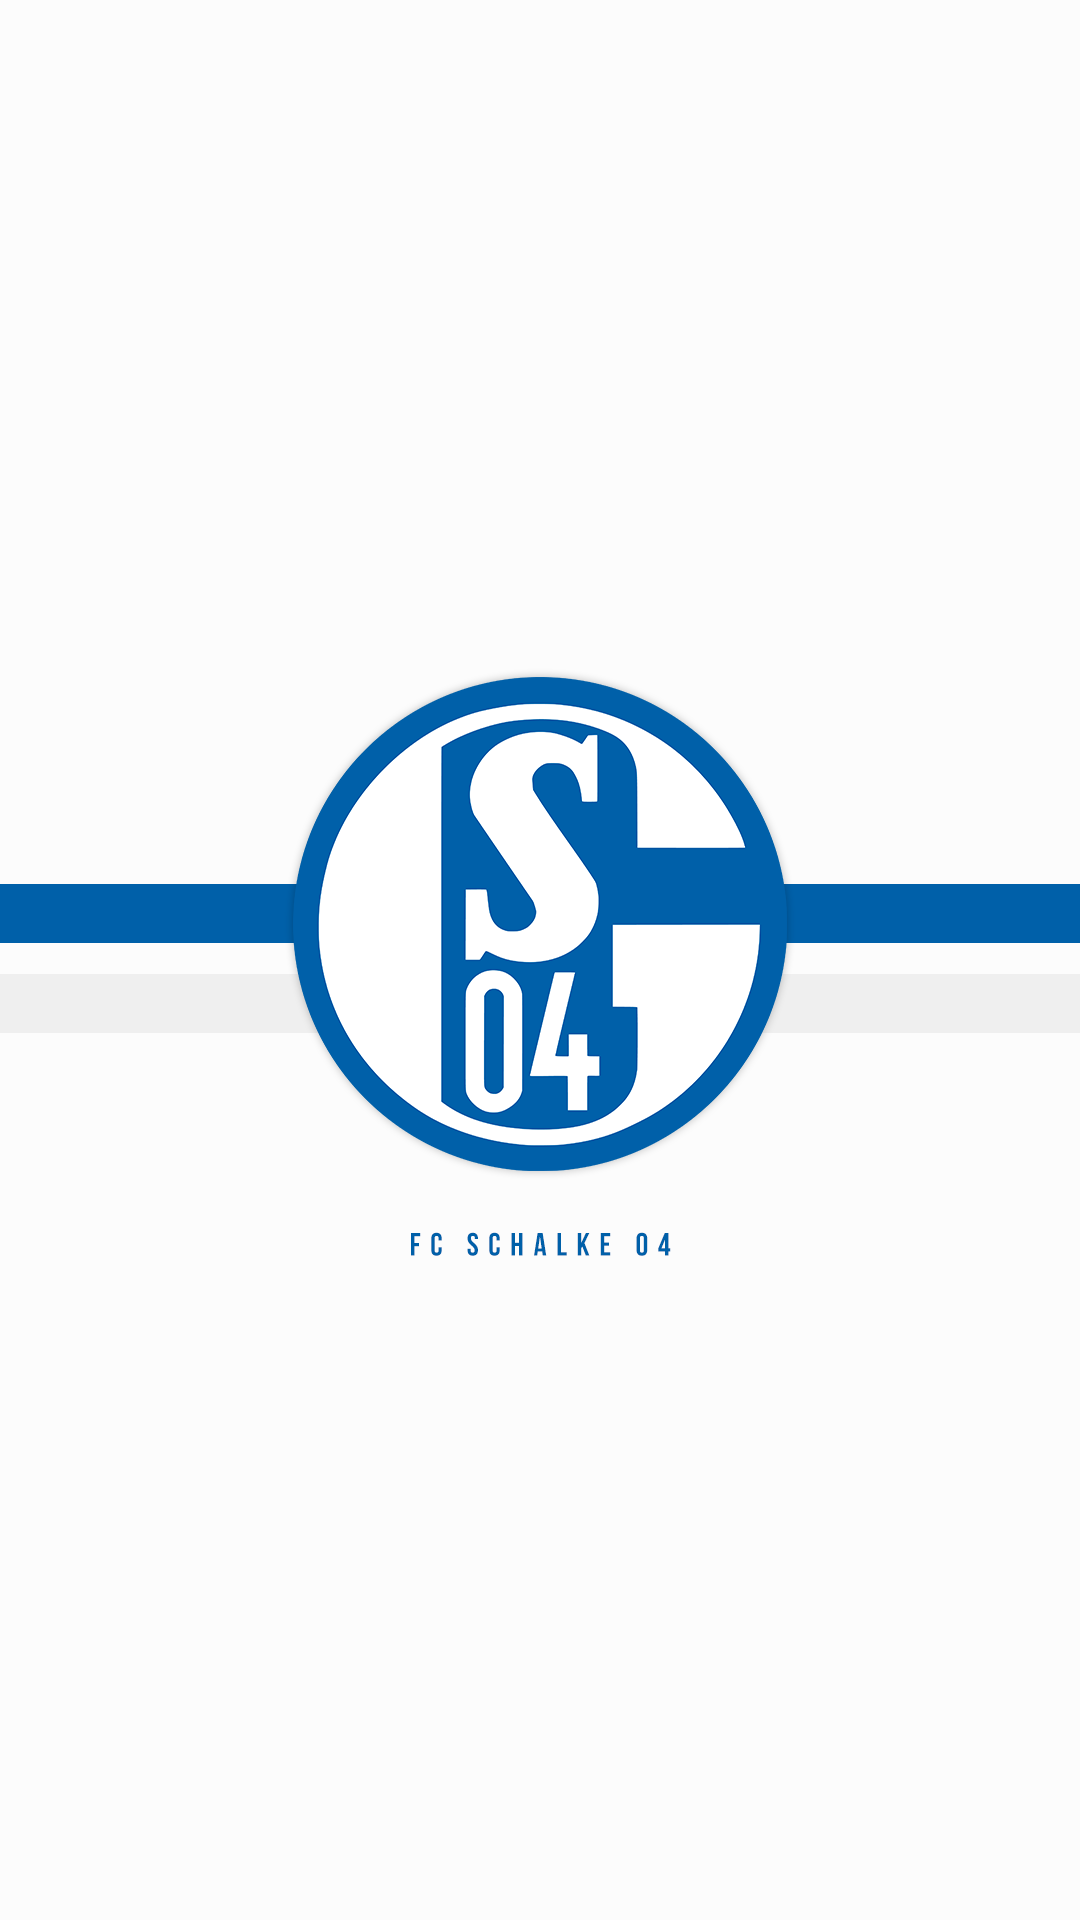 Schalke 04 Fc Schalke 04 Schalke S04 Bundesliga Phone Circle 969295 Hd Wallpaper Backgrounds Download